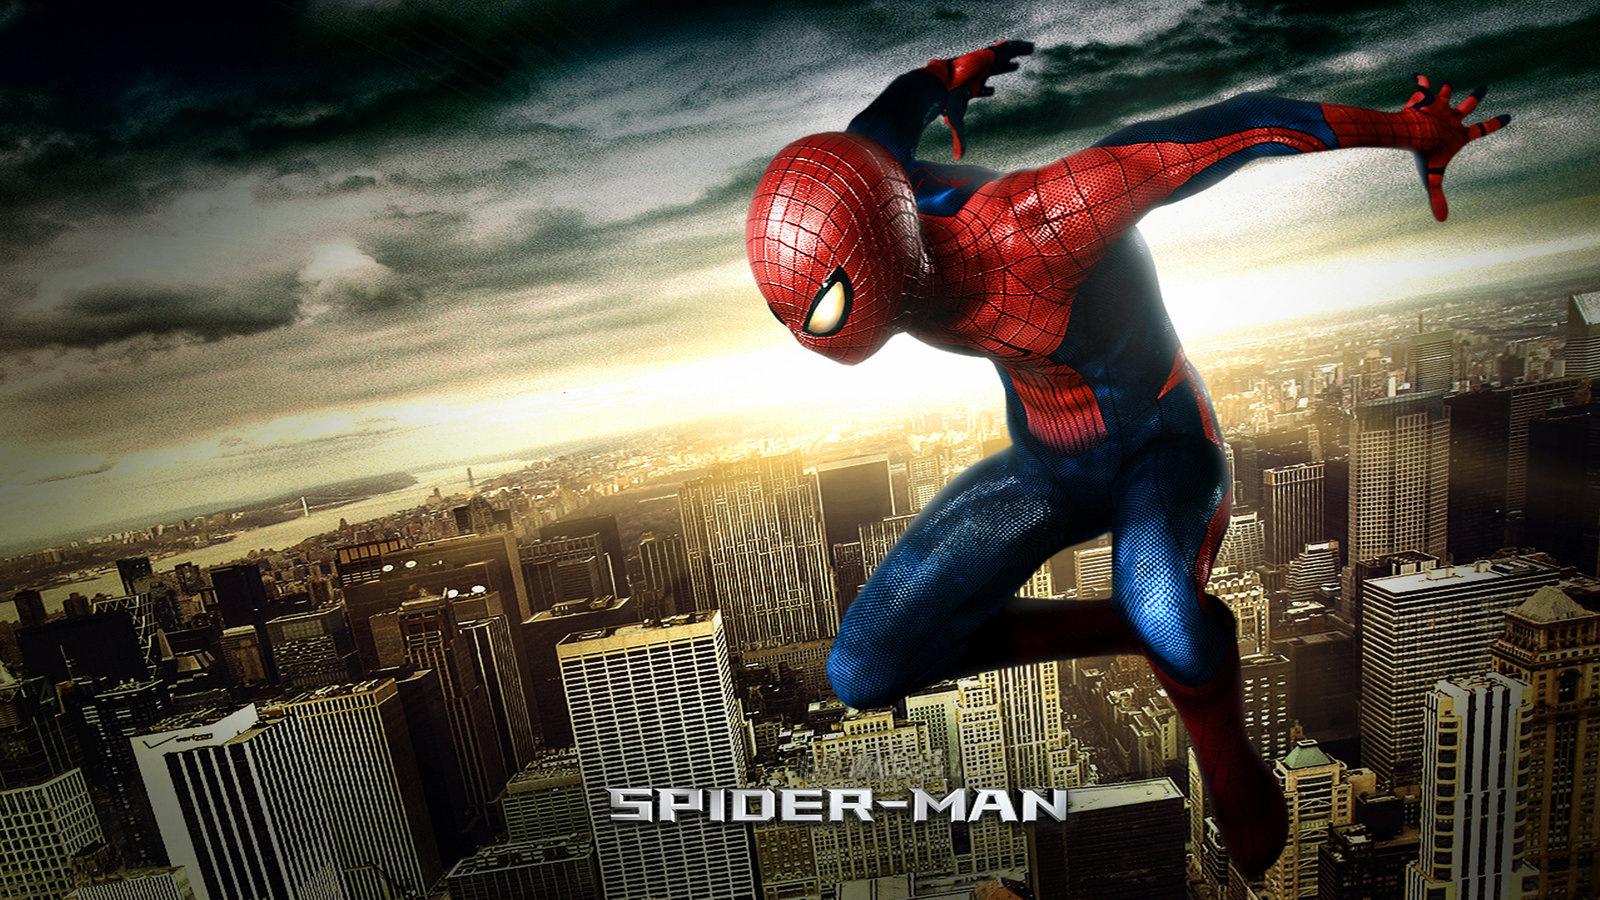 General 1600x900 Spider-Man movies digital art superhero